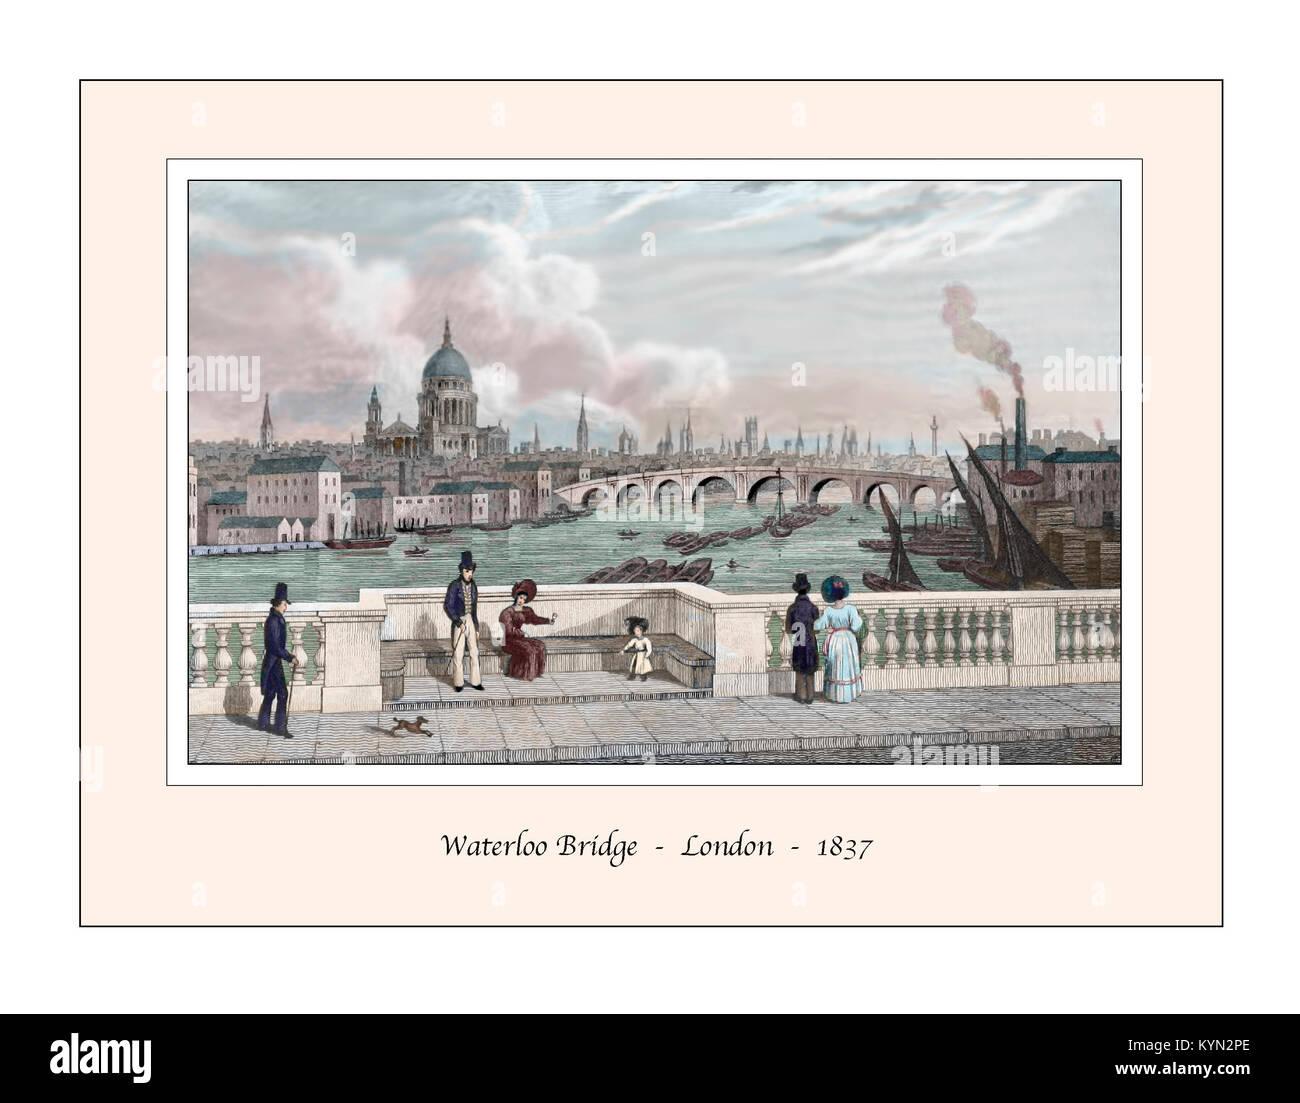 Waterloo Bridge London Original Design based on a 19th century Engraving - Stock Image